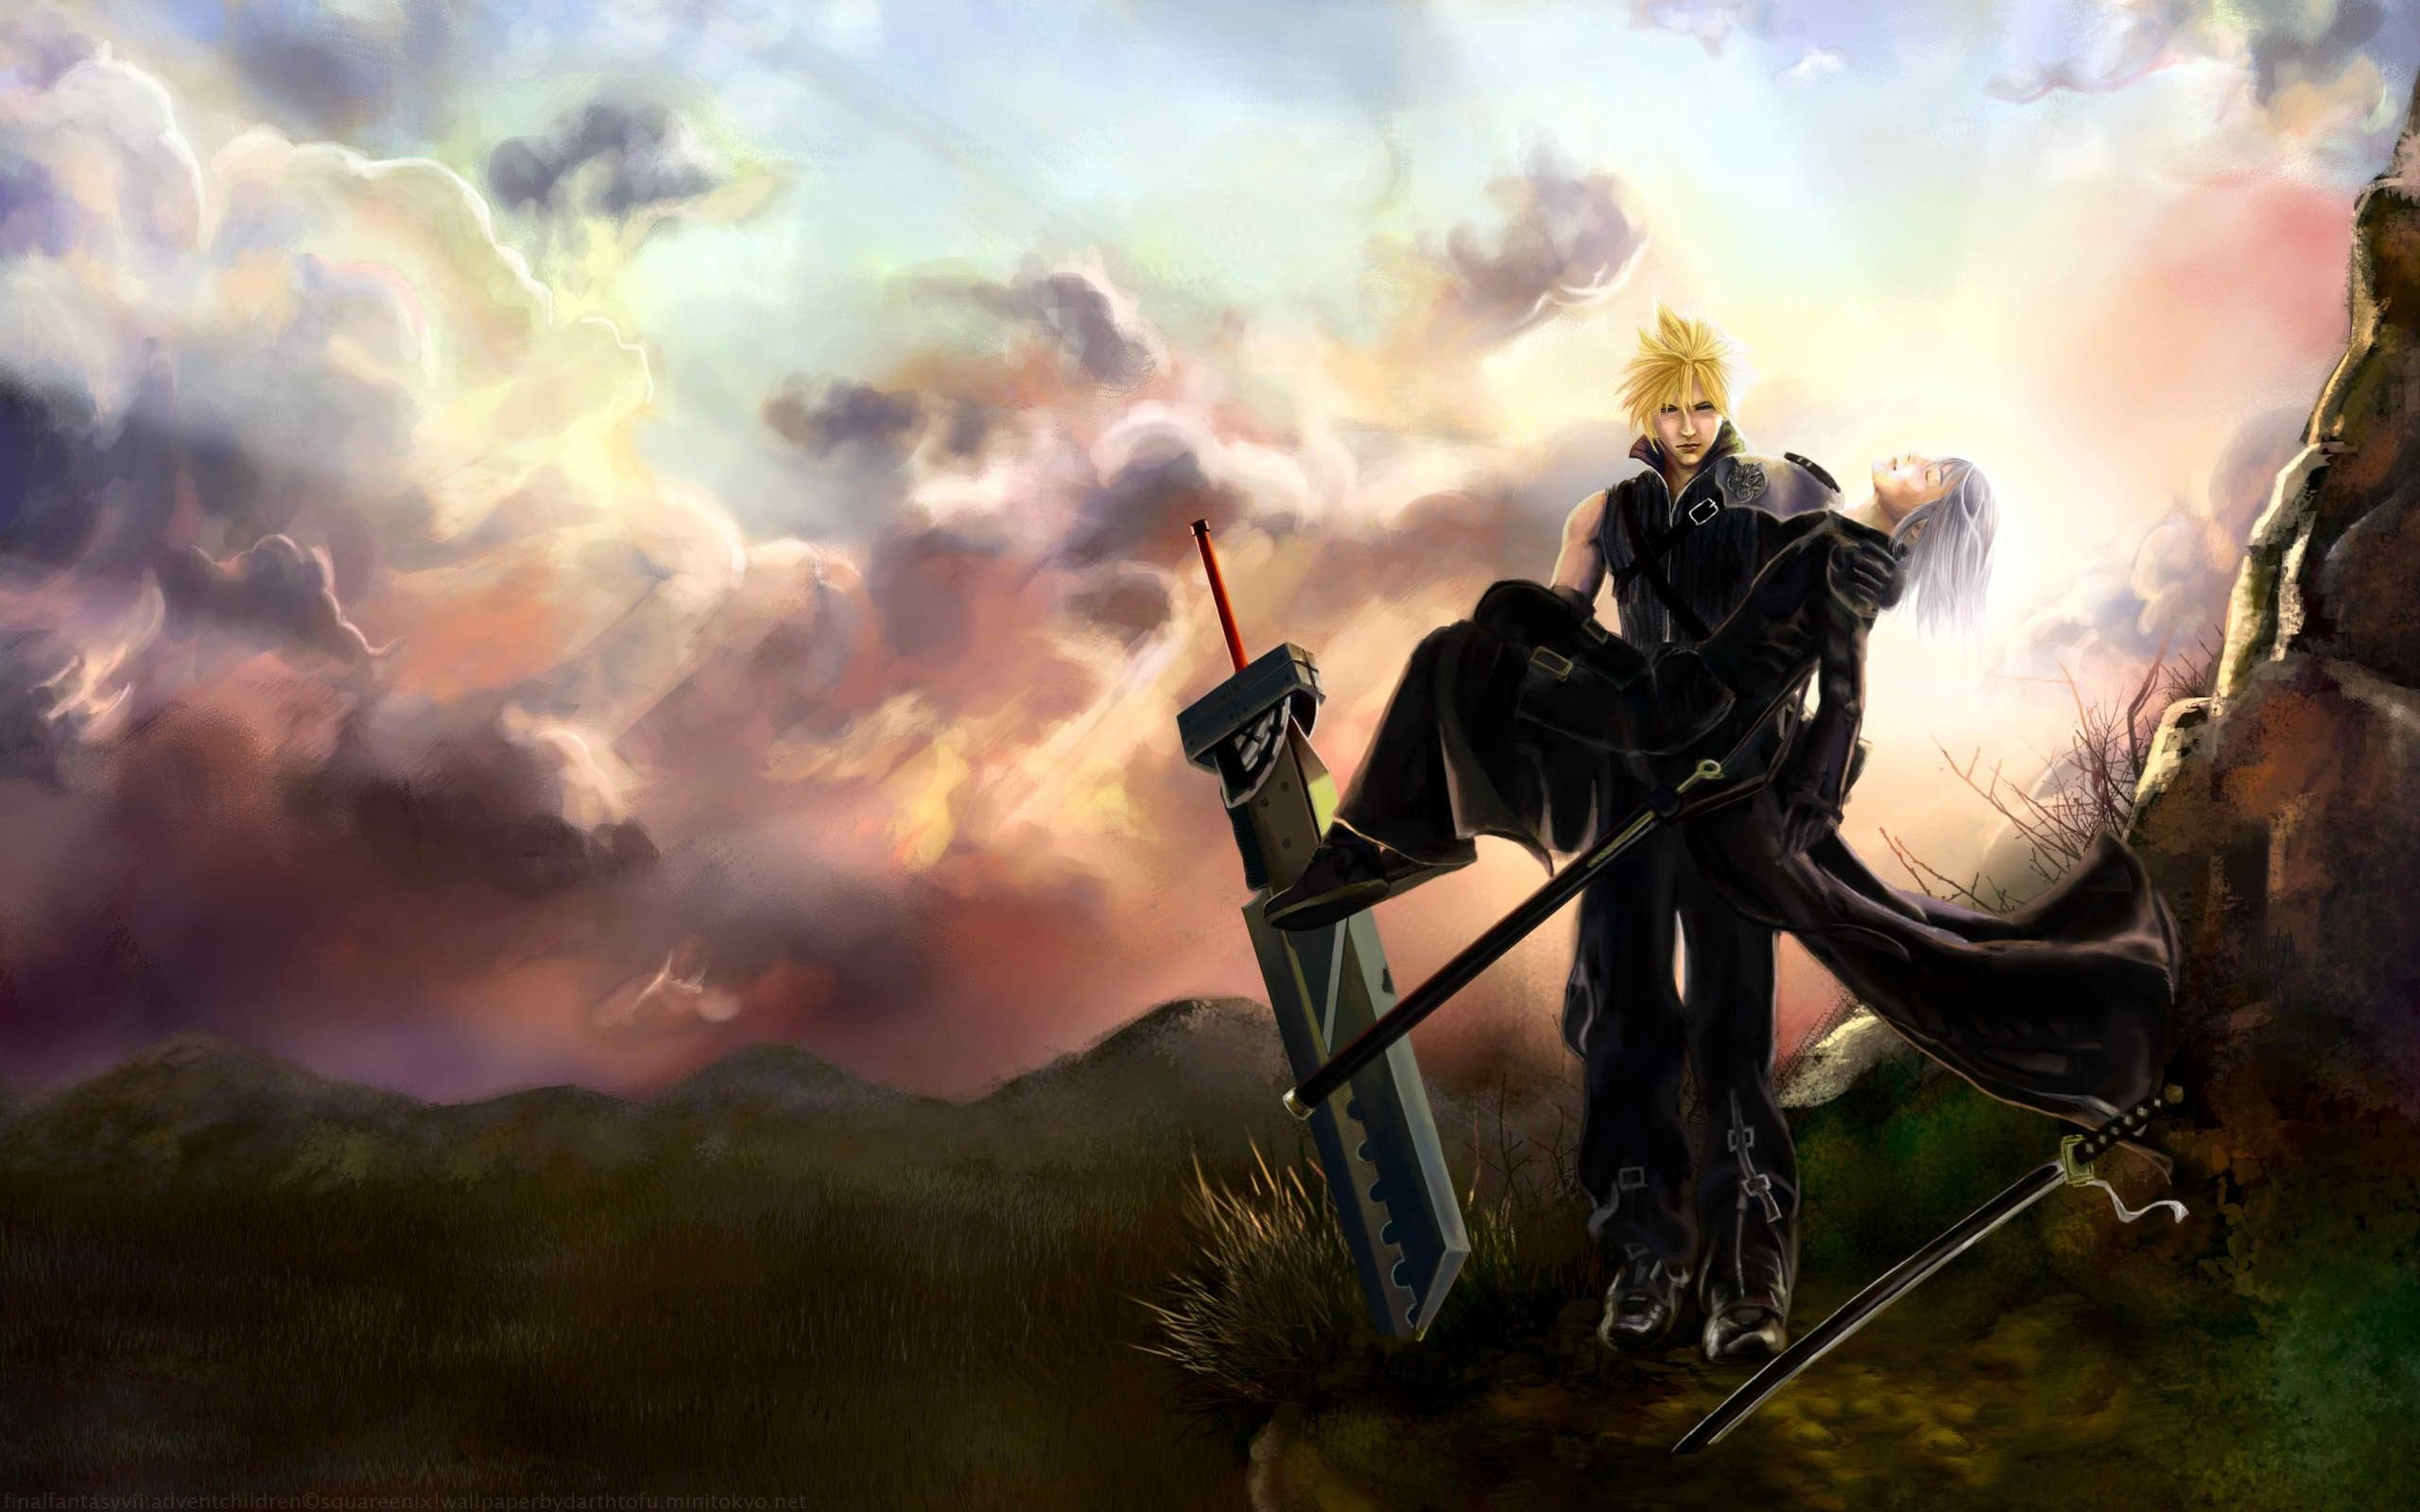 Final fantasy sephiroth cloud strife zack fair kadaj aerith .